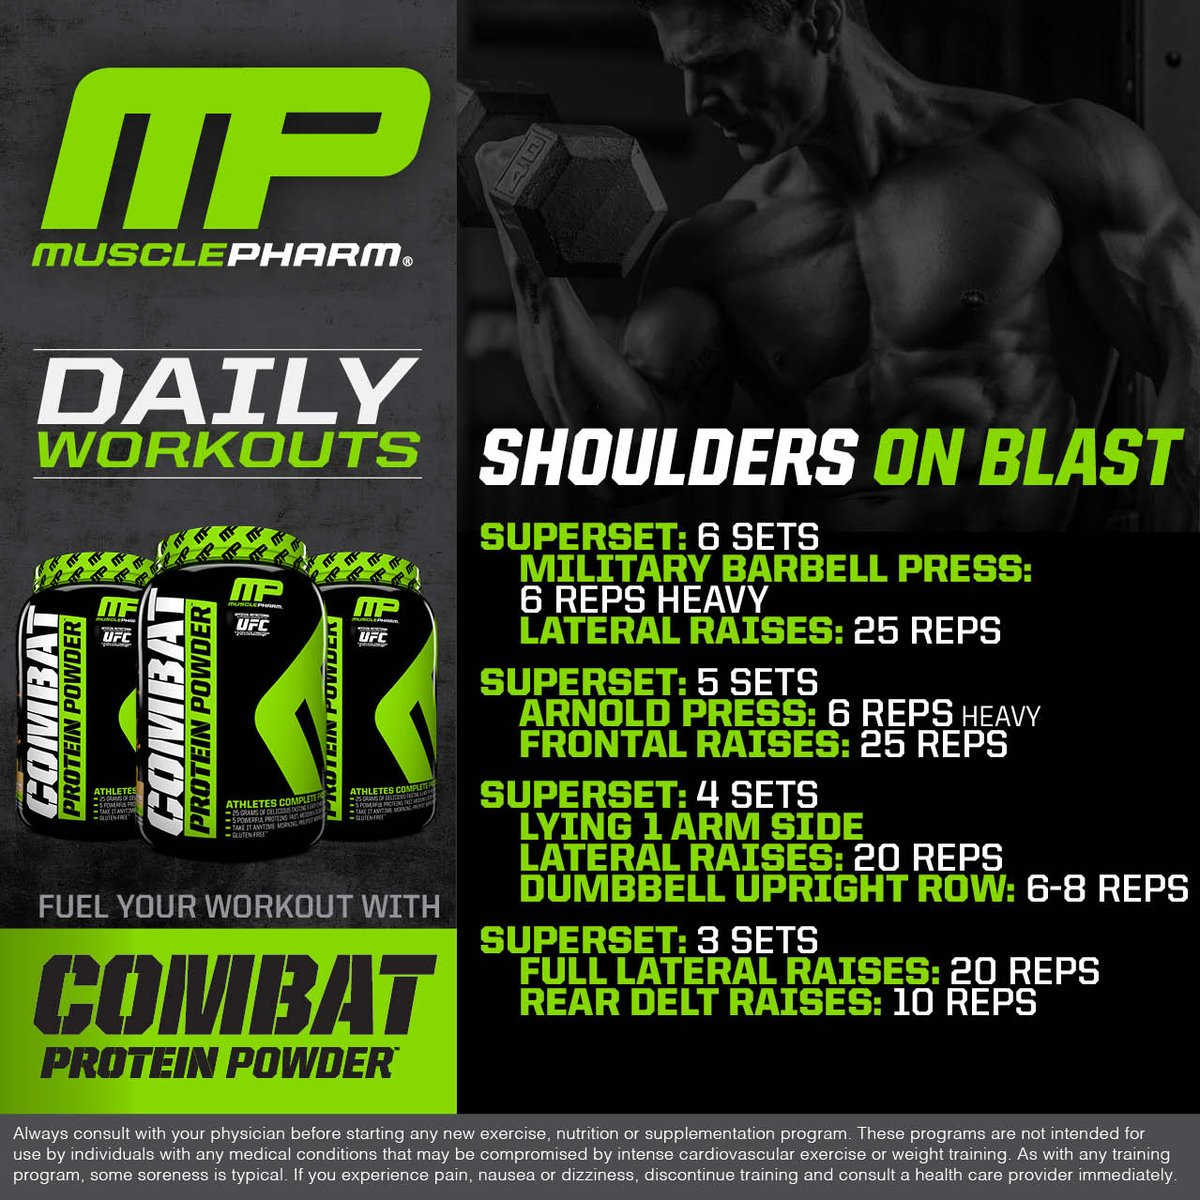 Musclepharm On Twitter Daily Workouts Shoulders Muscle Pharm Workout Program Jpg 1200x1200 Laron